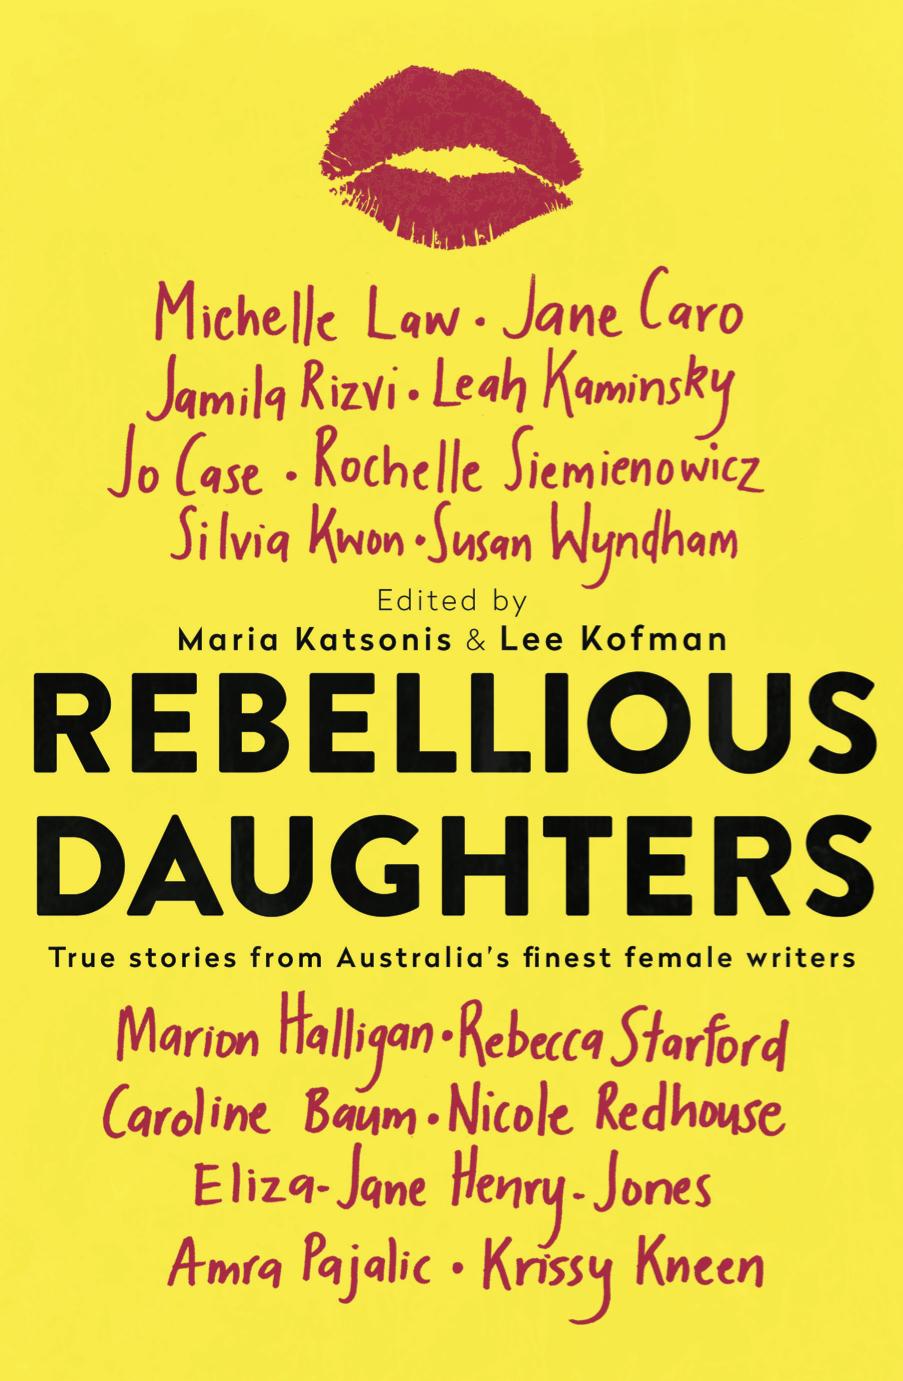 Rebellious Daughters_FINAL.jpg